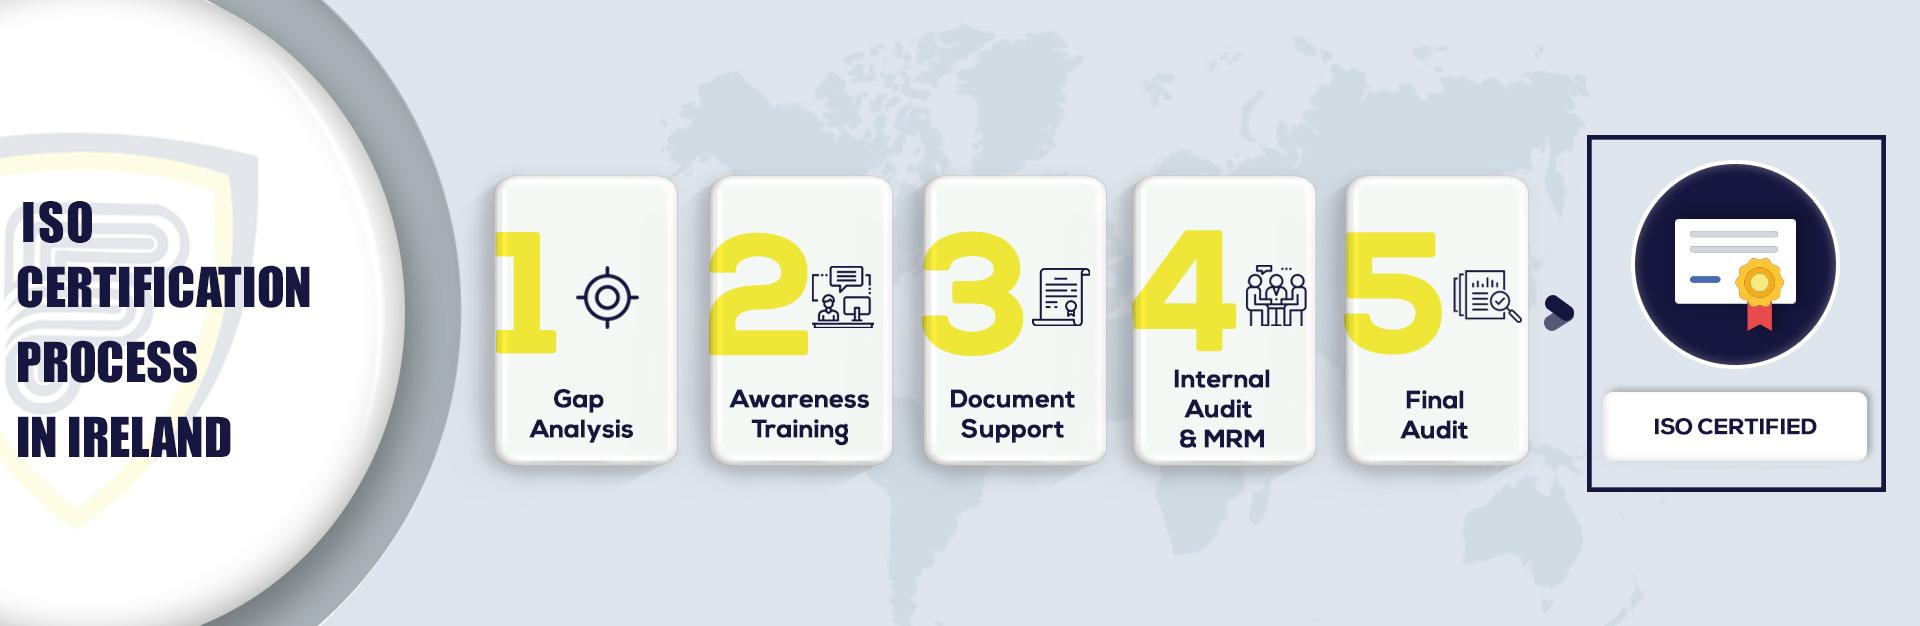 ISO Certification in Ireland